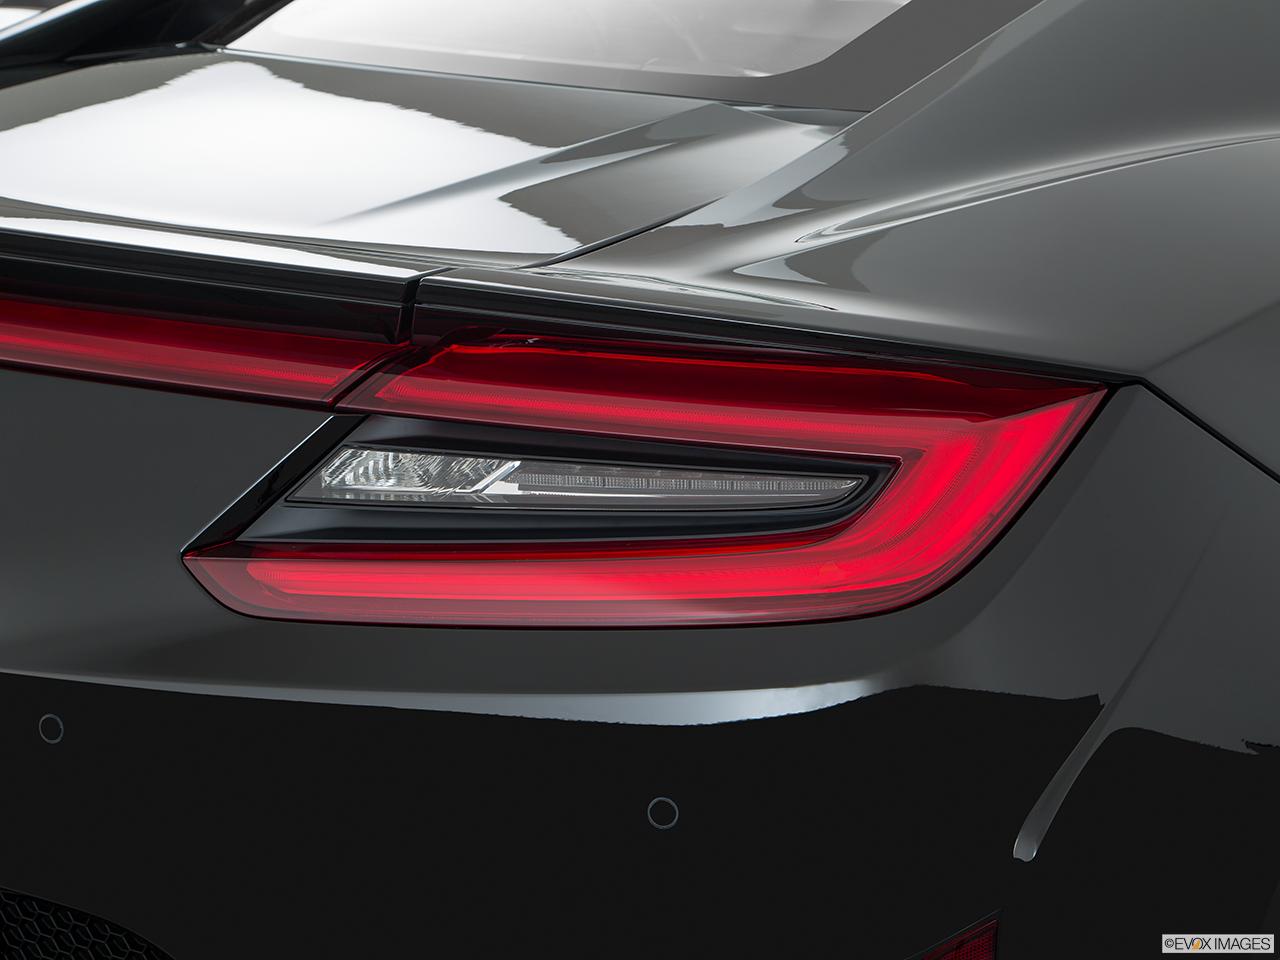 2019 Acura NSX photo